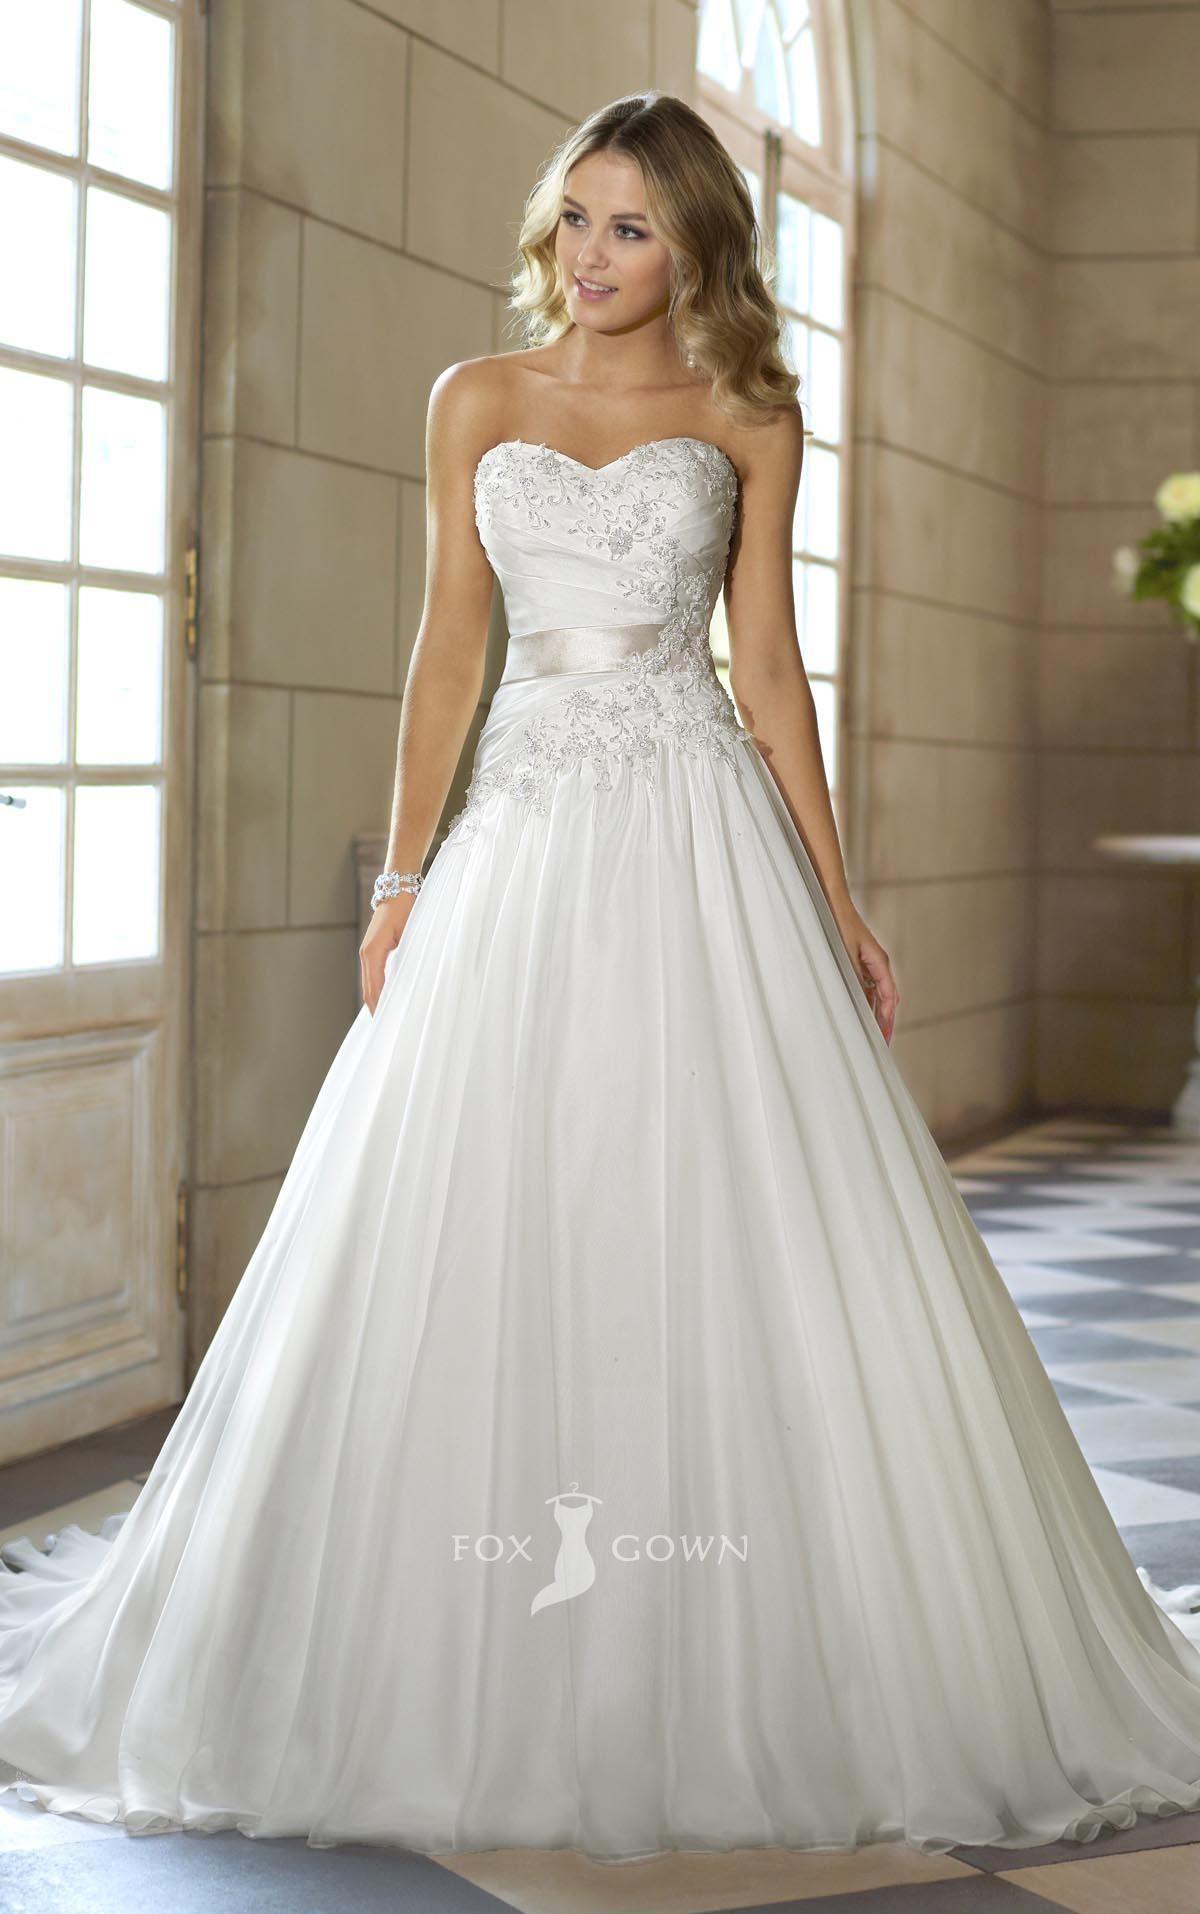 Sweetheart ball gown wedding dress  lovely strapless sweetheart ball gown embroidered bodice wedding